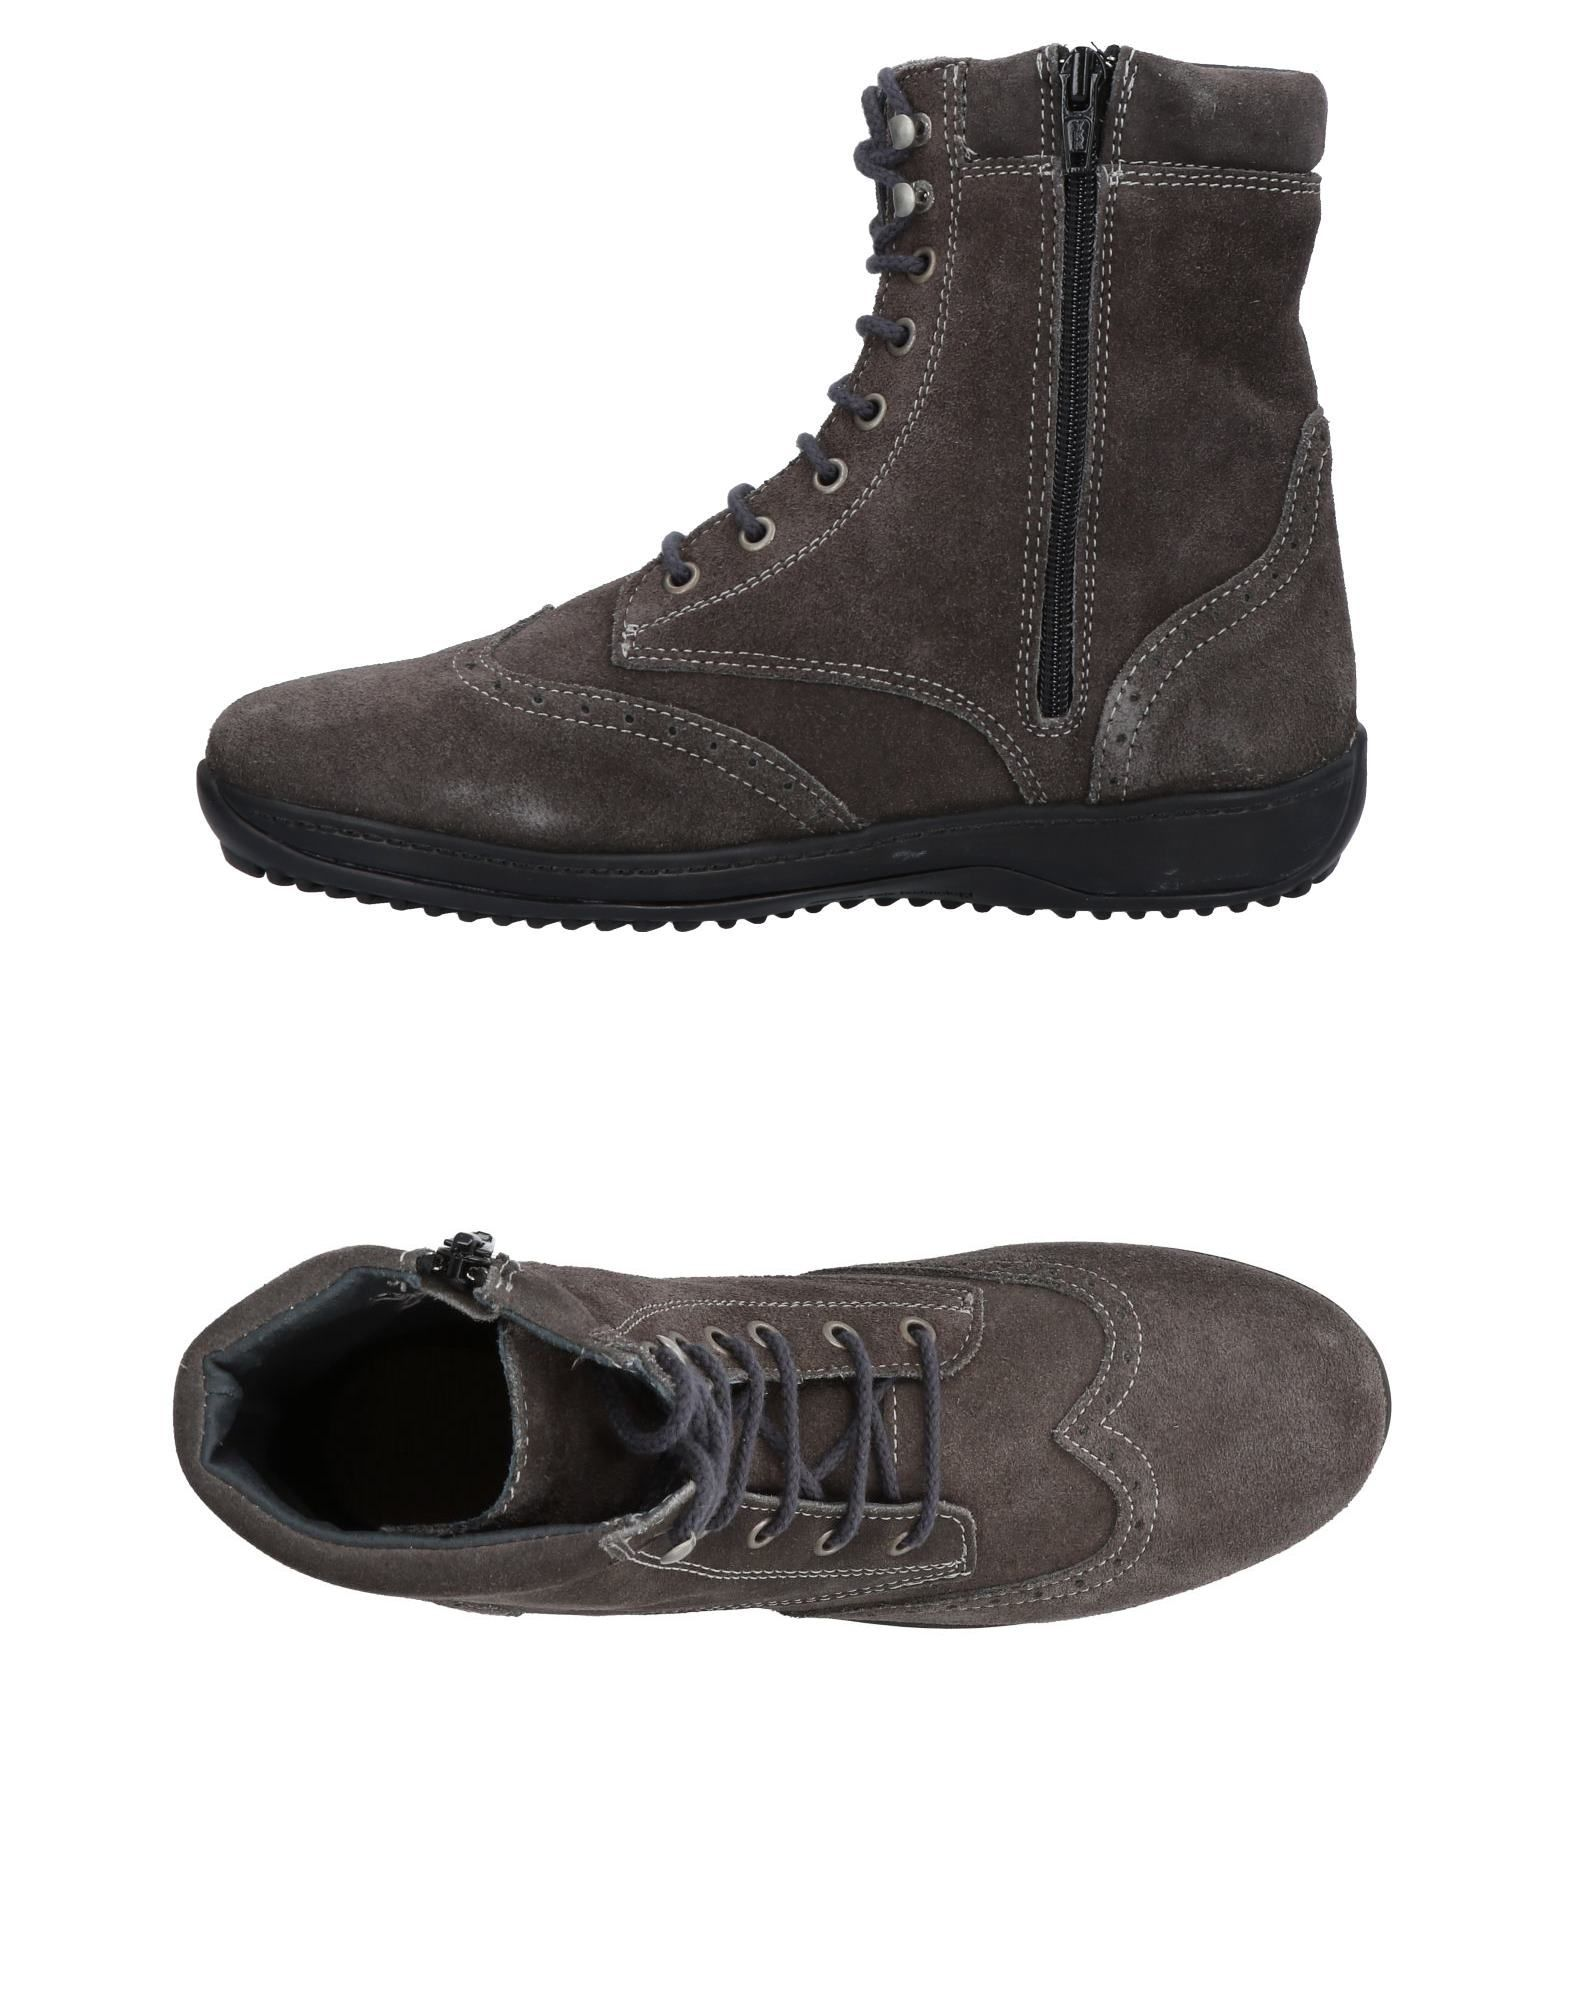 Swissies Sneakers Damen  11458045IA Gute Qualität beliebte Schuhe